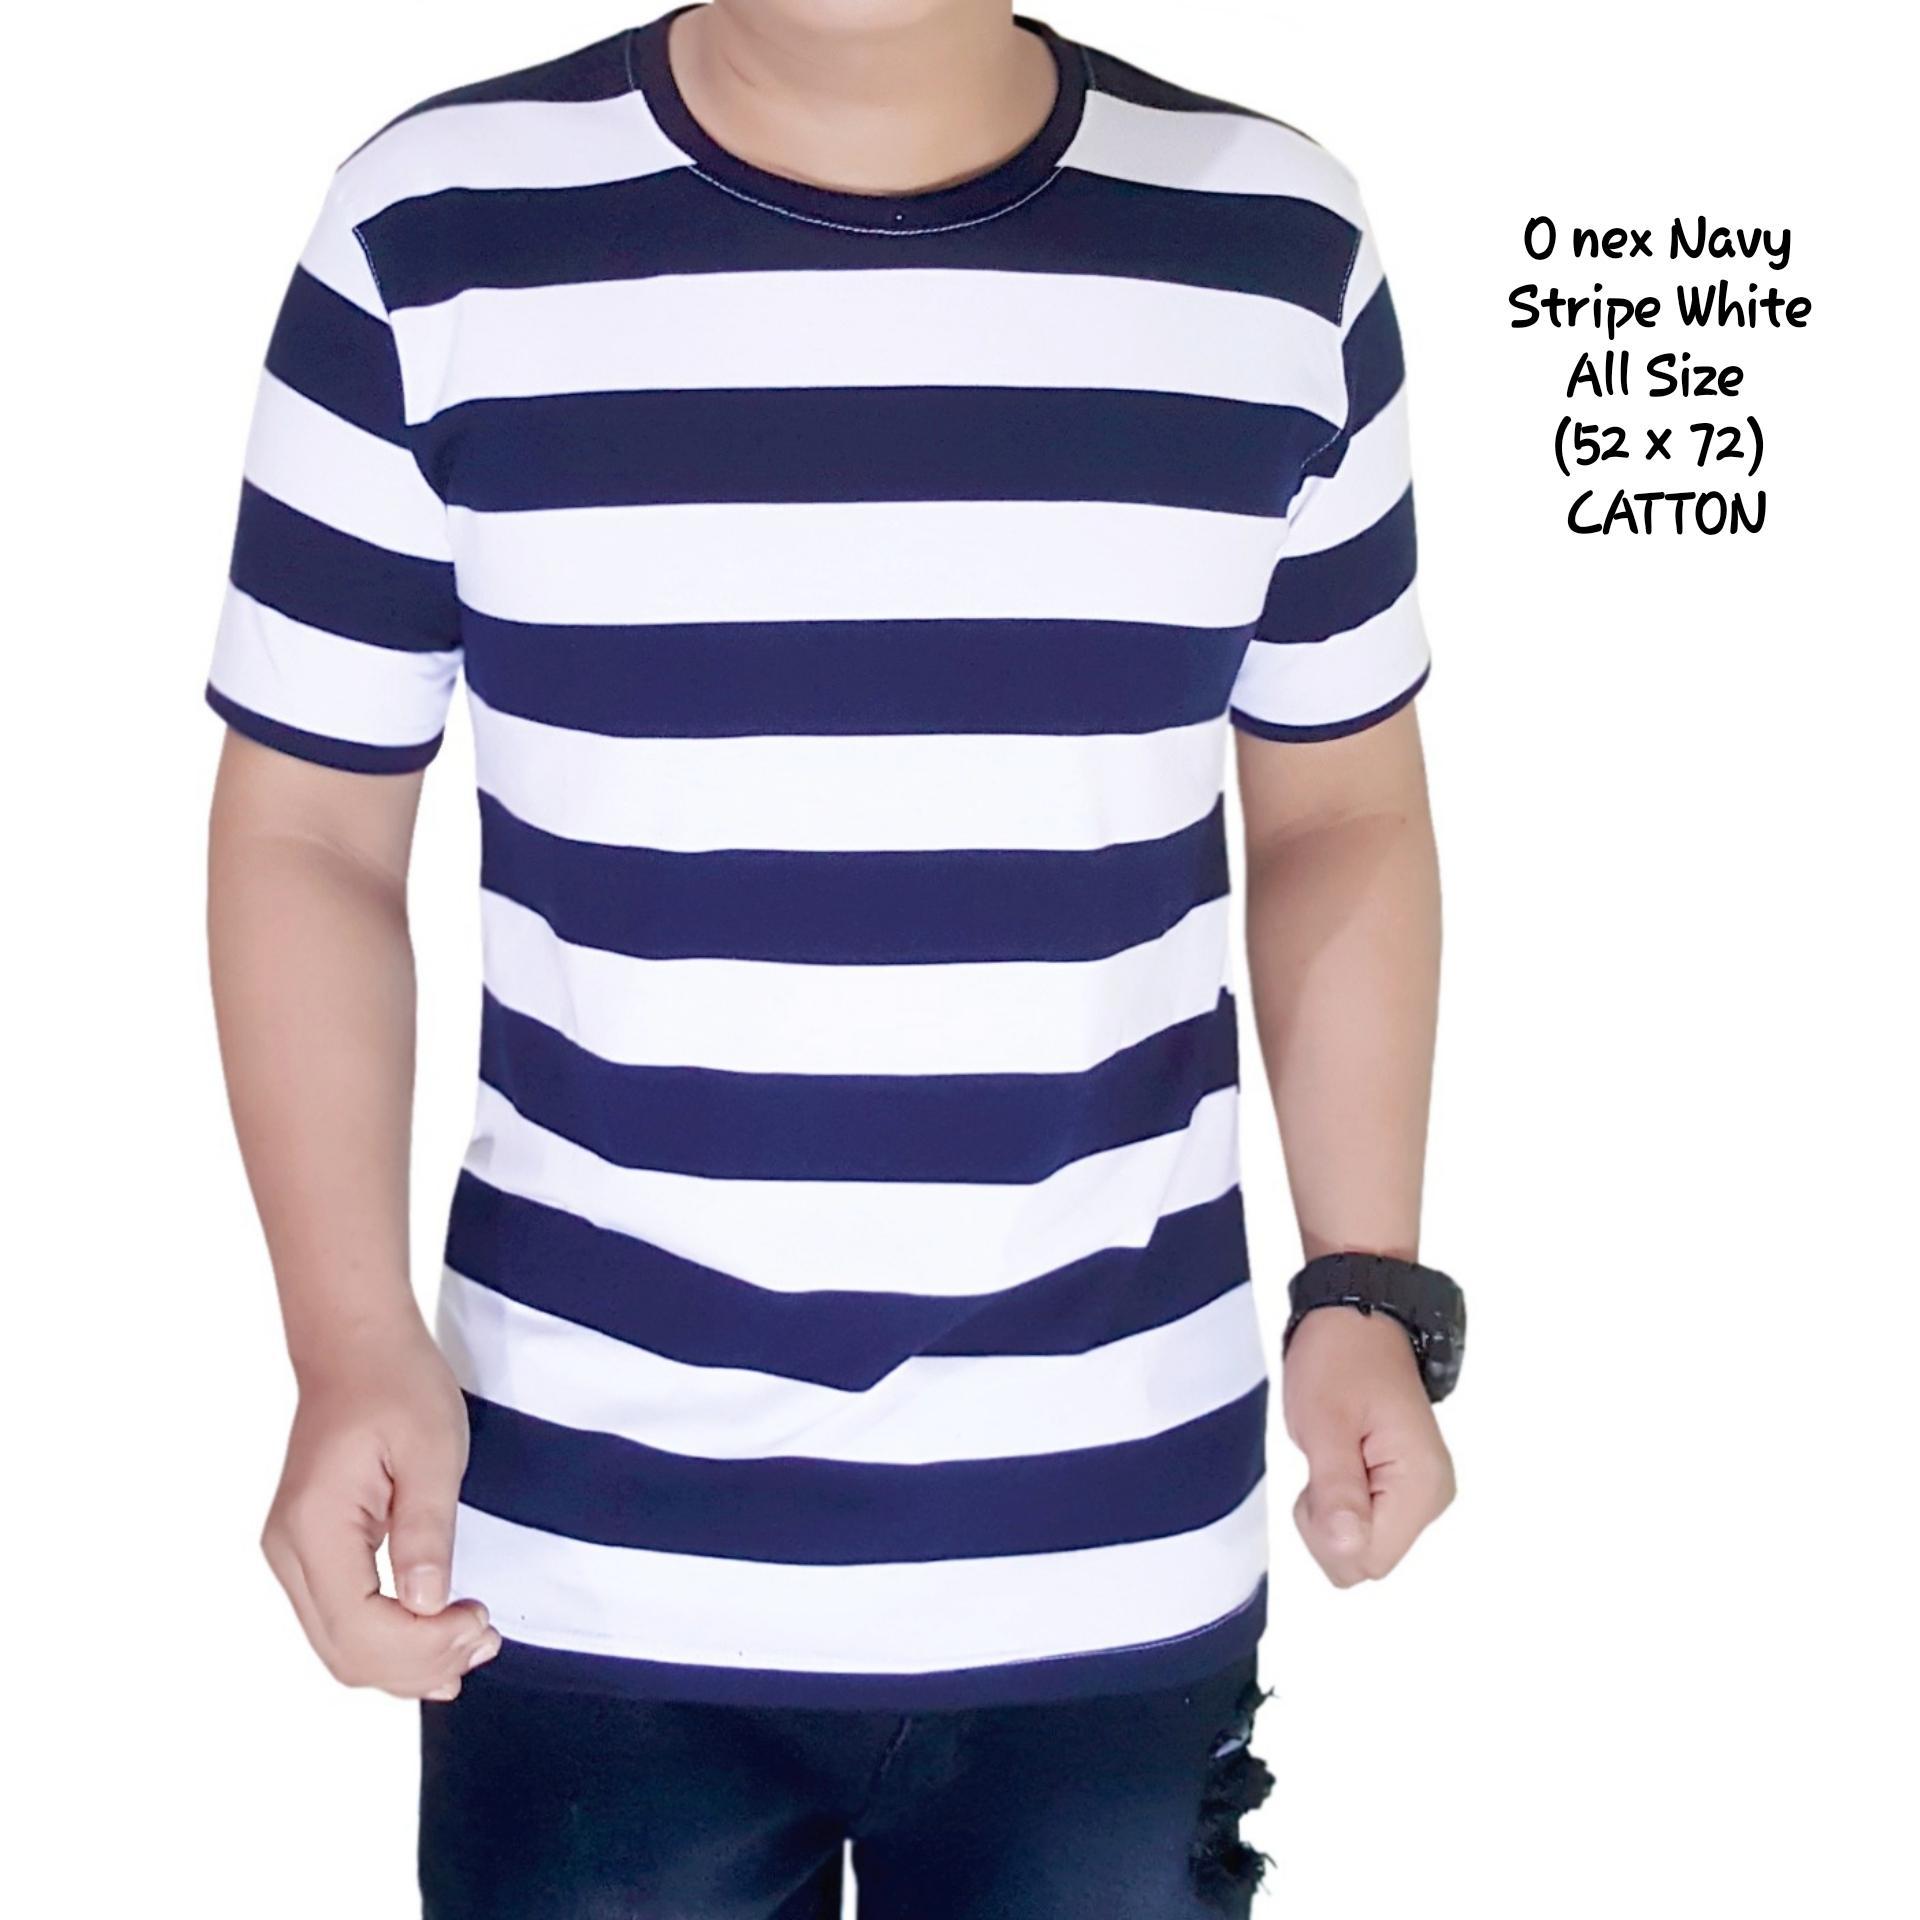 Anugrahshop – kaos distro T-shirt Fashion 100% soft cotton combed 30s premium pria